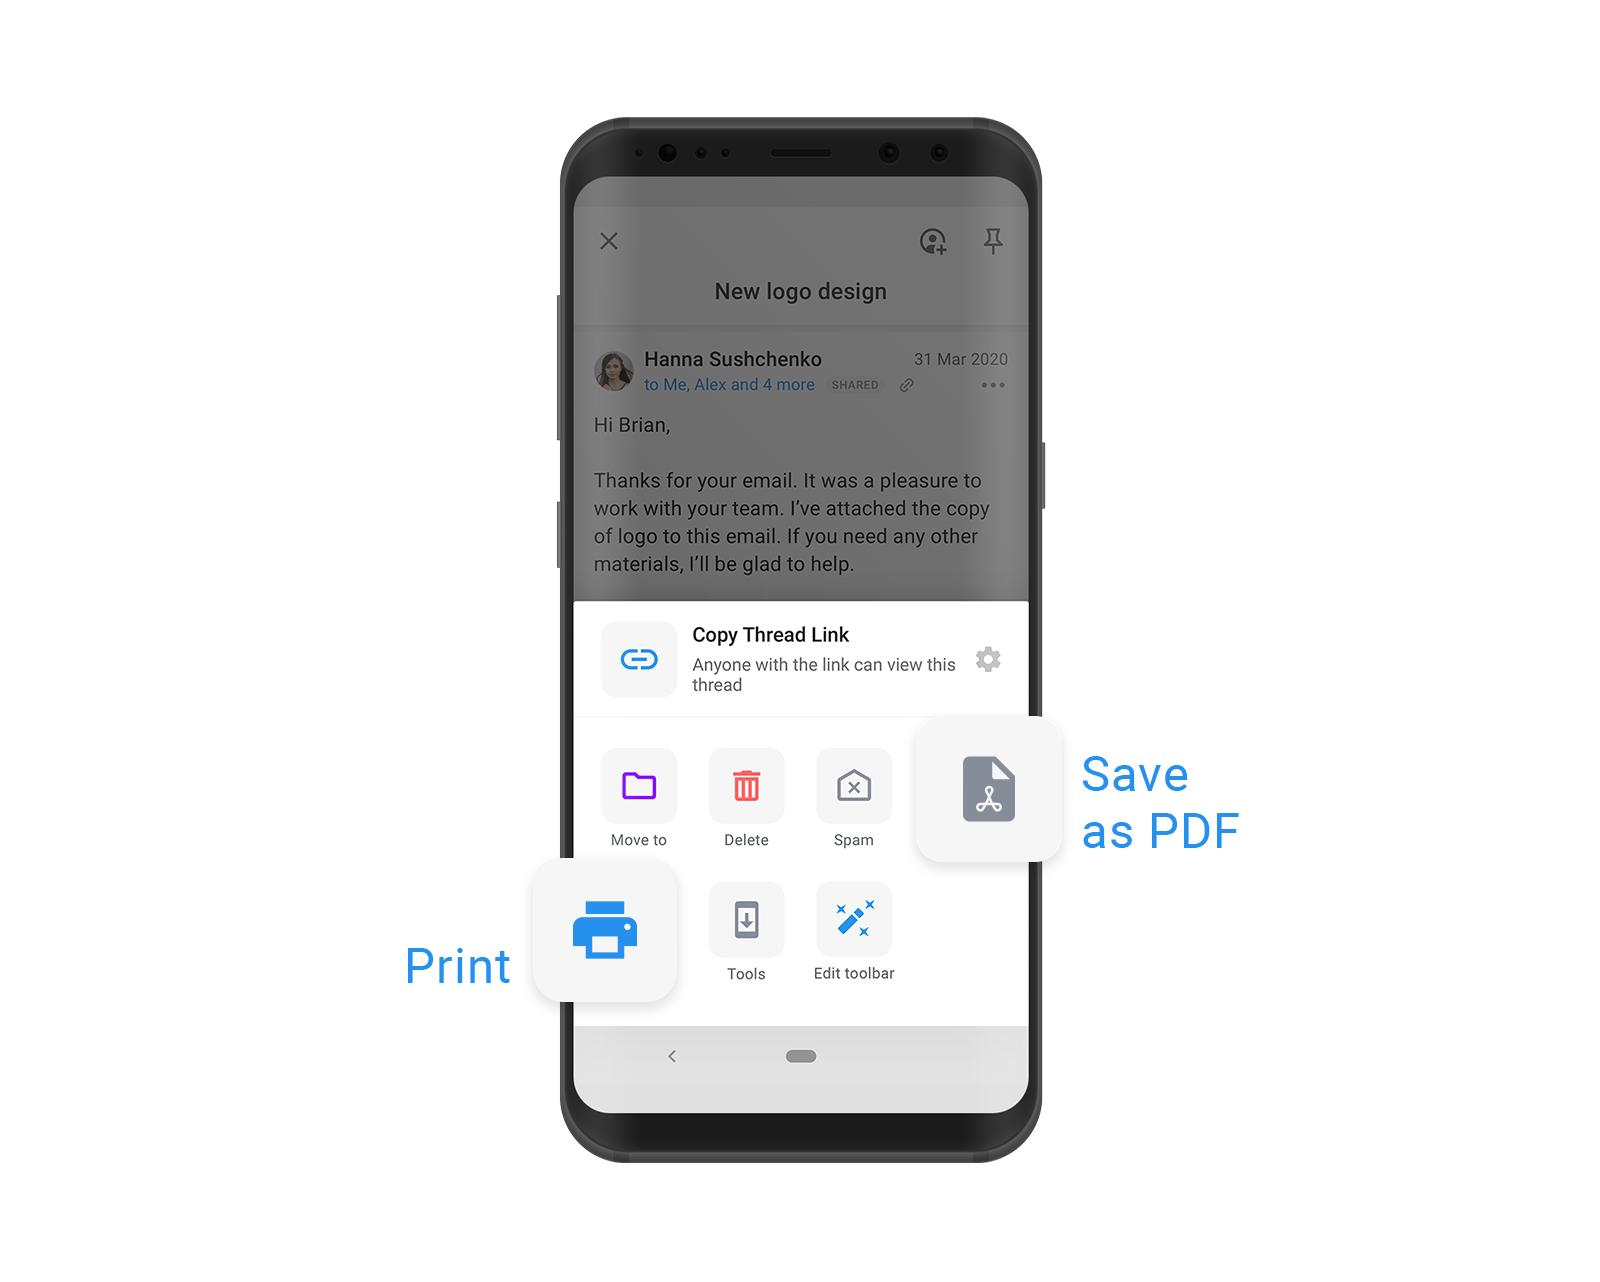 Print or Save as PDF